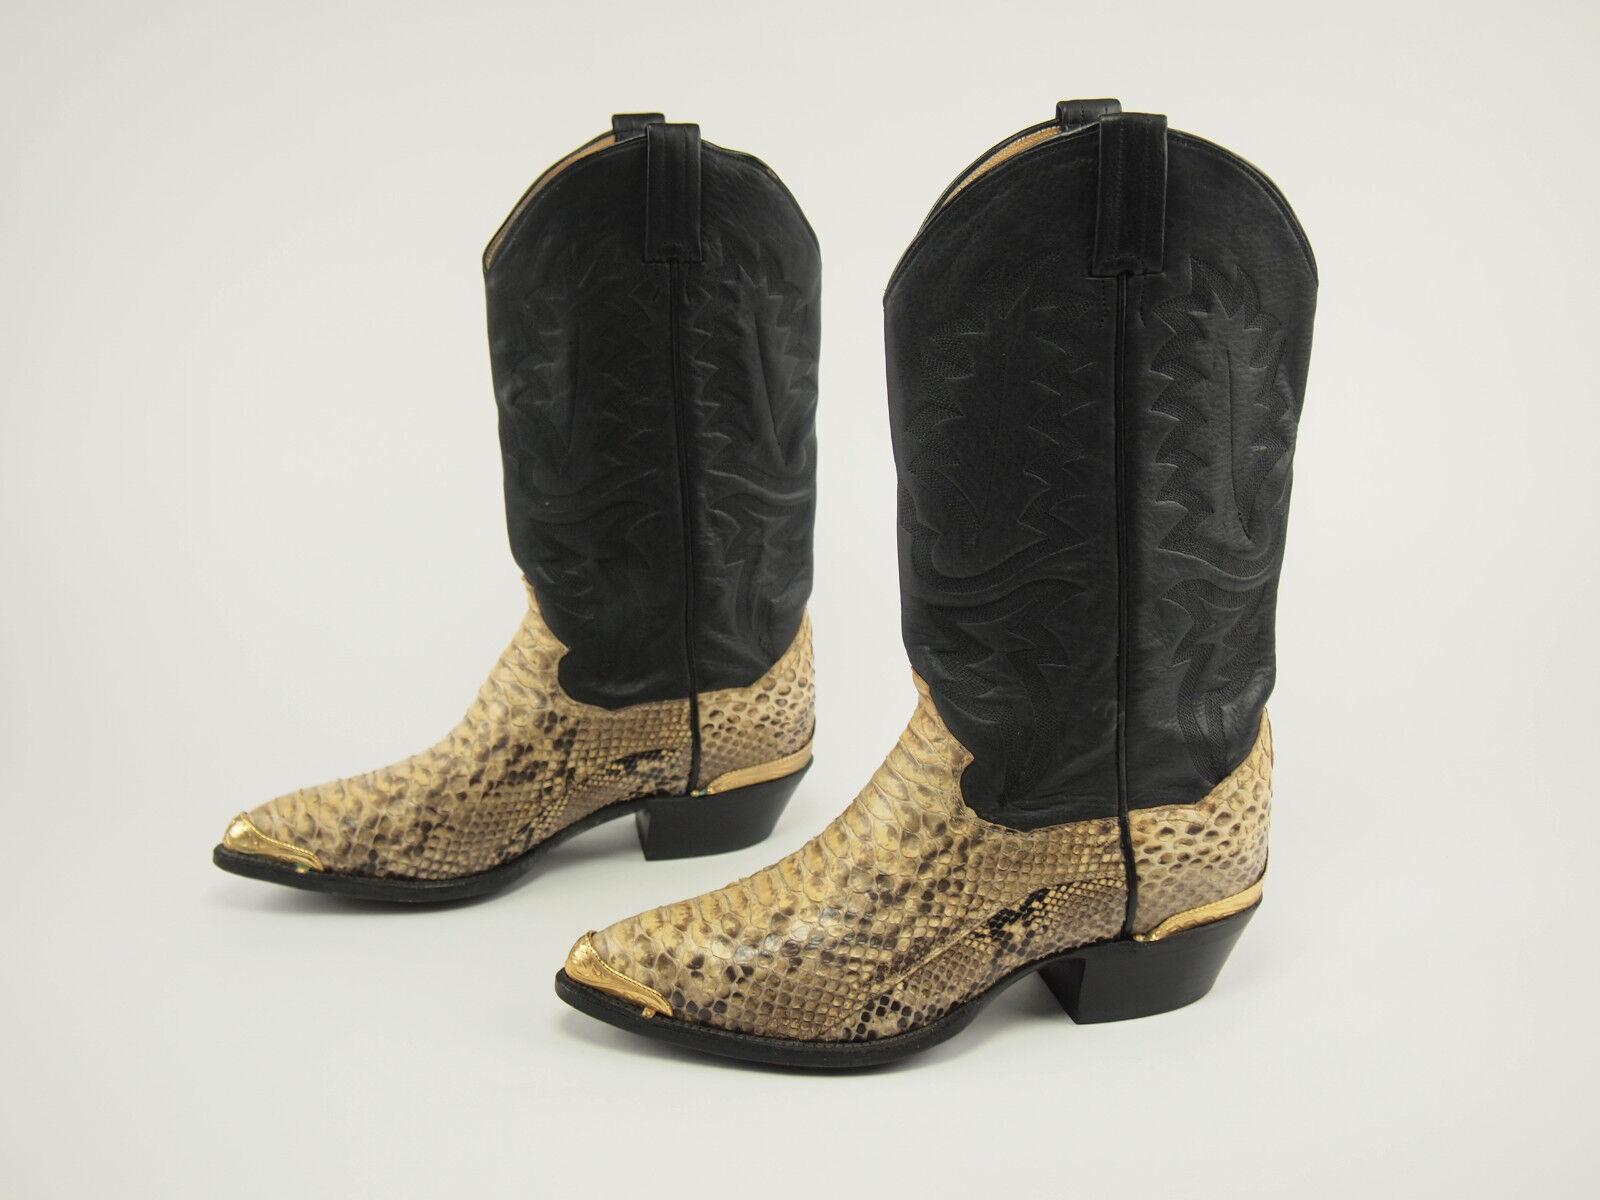 1980s PANHANDLE SLIM Vintage Vintage Vintage Python Western Cowboy Stivali 7.5 EE 8bdb46